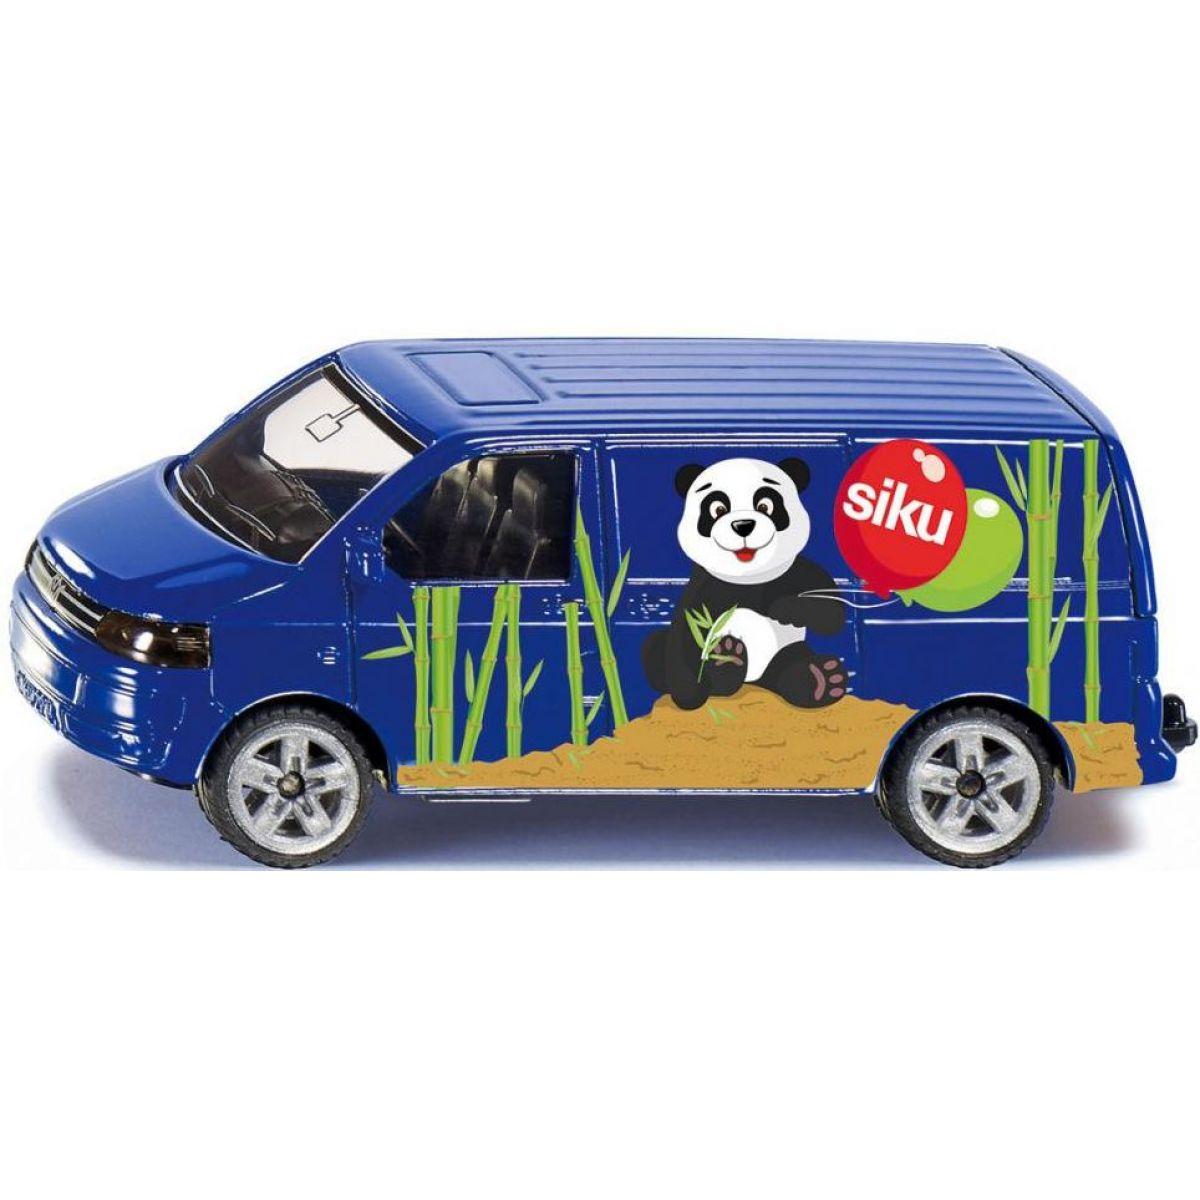 Siku Blister VW Transporter